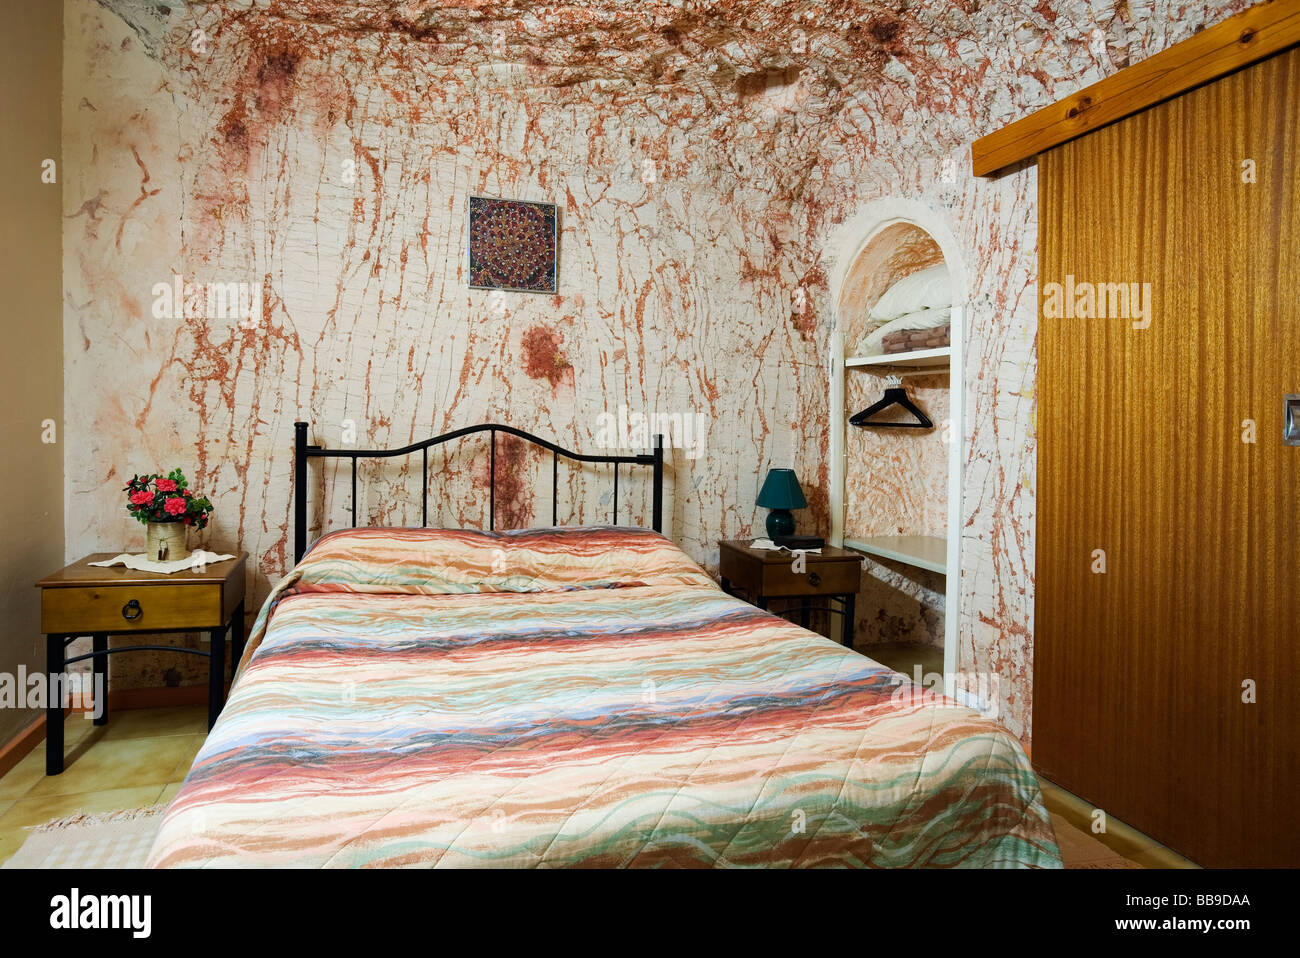 Underground room at Radeka's Downunder Dugout Motel. Coober Pedy, South Australia, AUSTRALIA - Stock Image